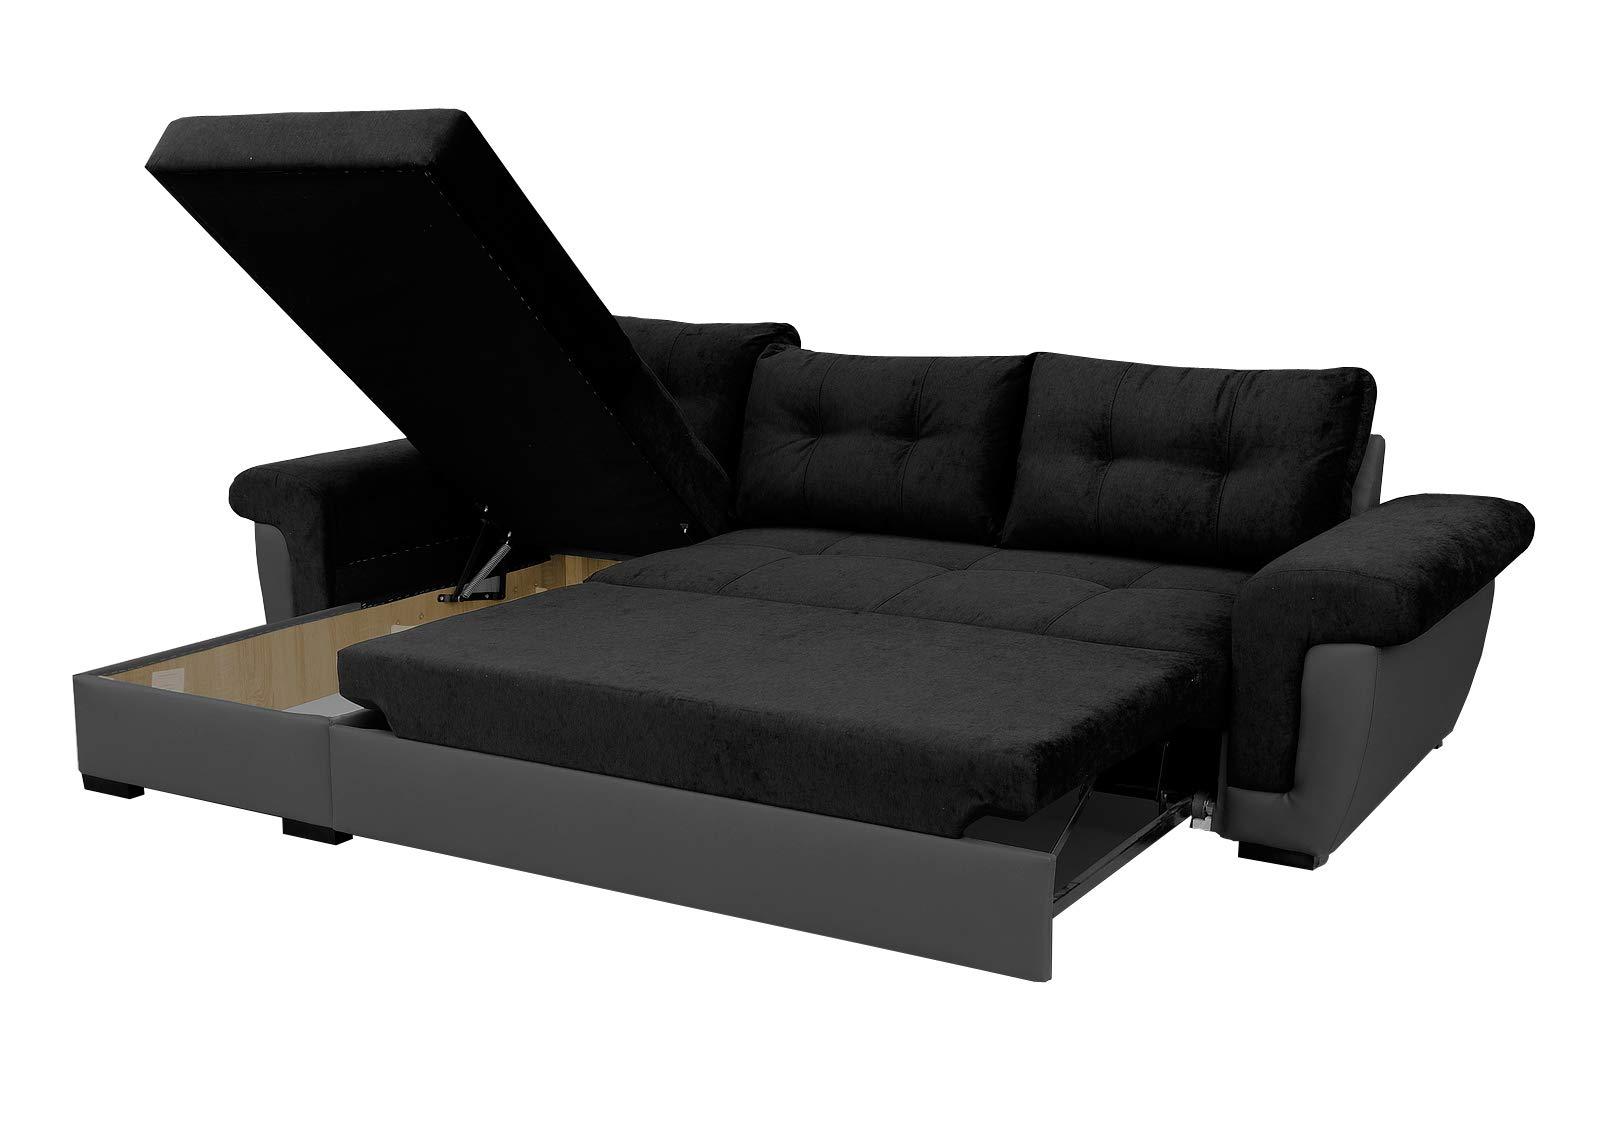 Sofafox CORNER SOFA BED WITH STORAGE - Buy Online in UAE ...